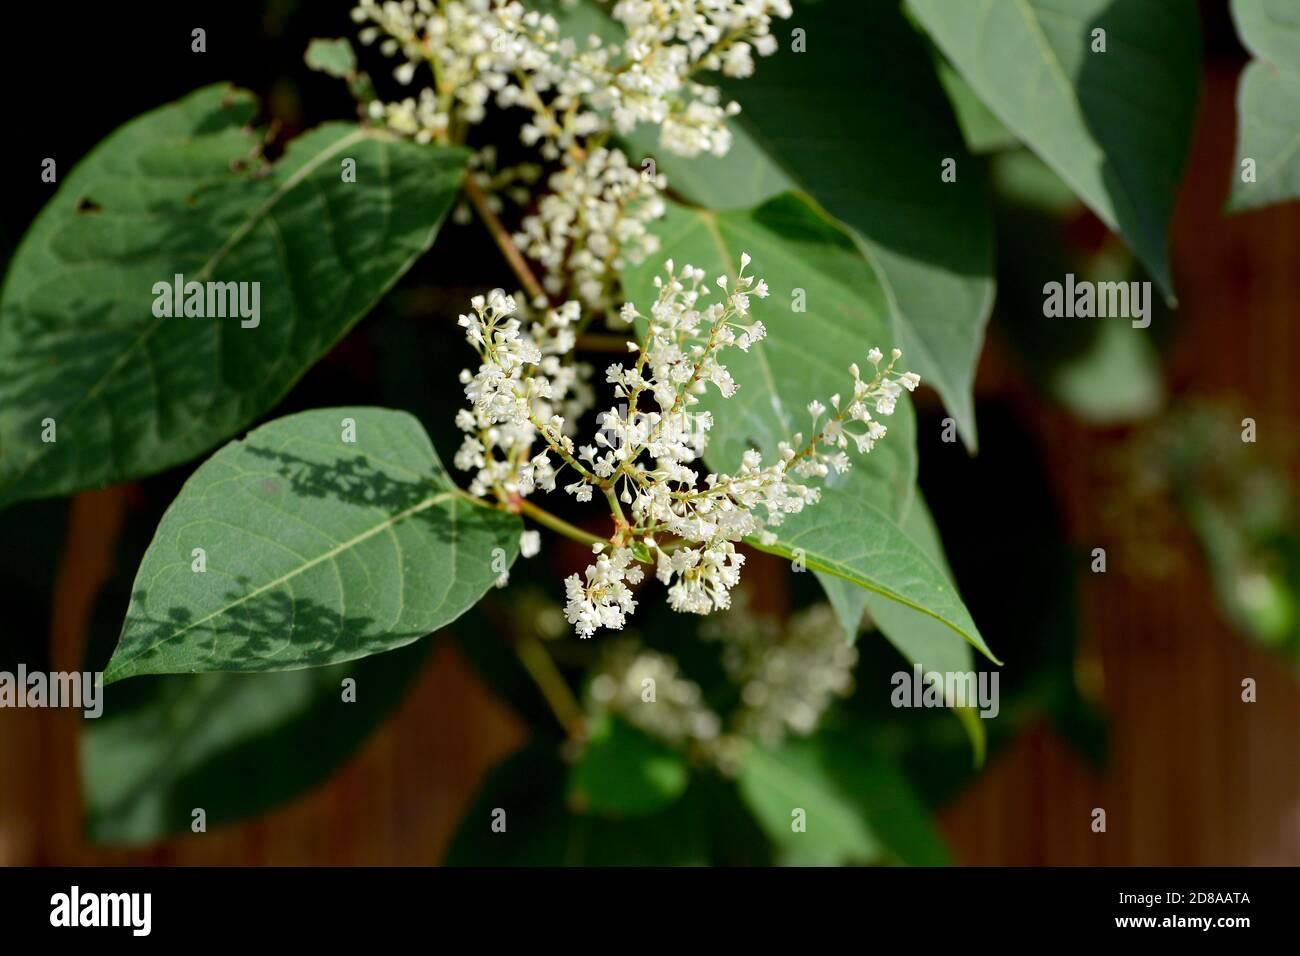 Asian knotweed or Japanese knotweed, Japanischer Staudenknöterich, Fallopia japonica, ártéri japánkeserűfű Stock Photo